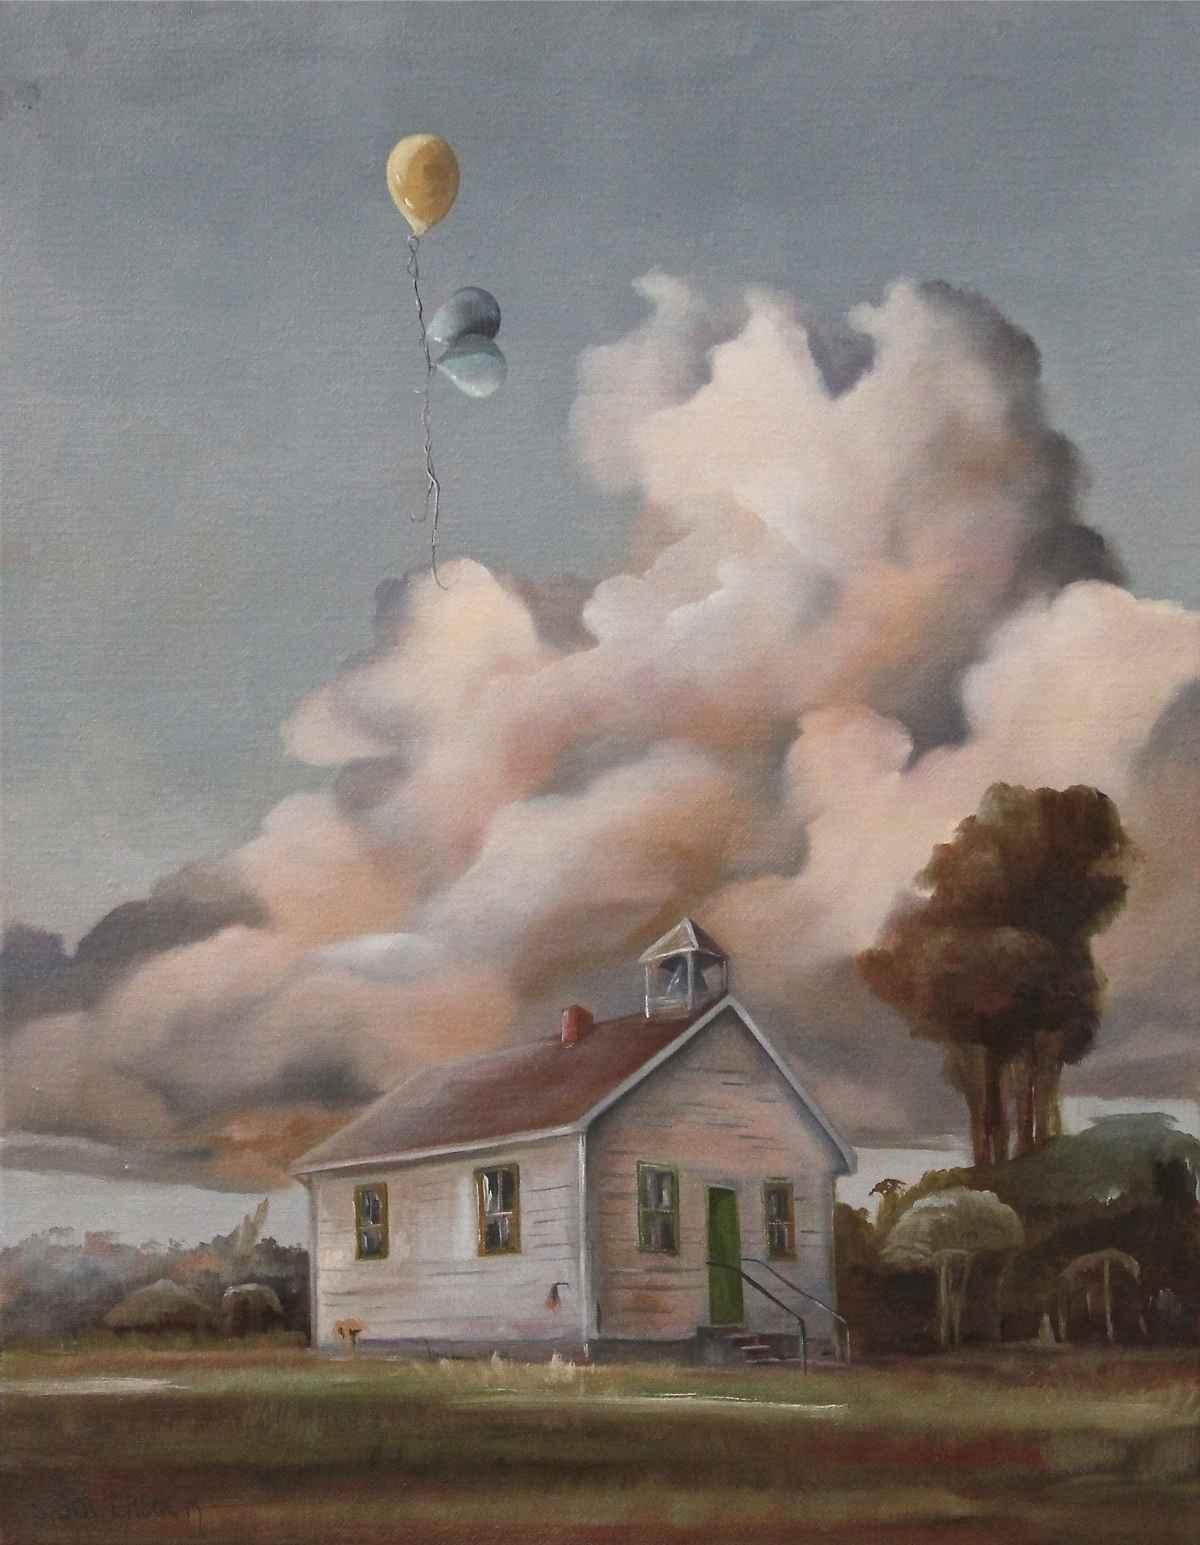 Forgotten Memories by  Steve Bowersock - Masterpiece Online